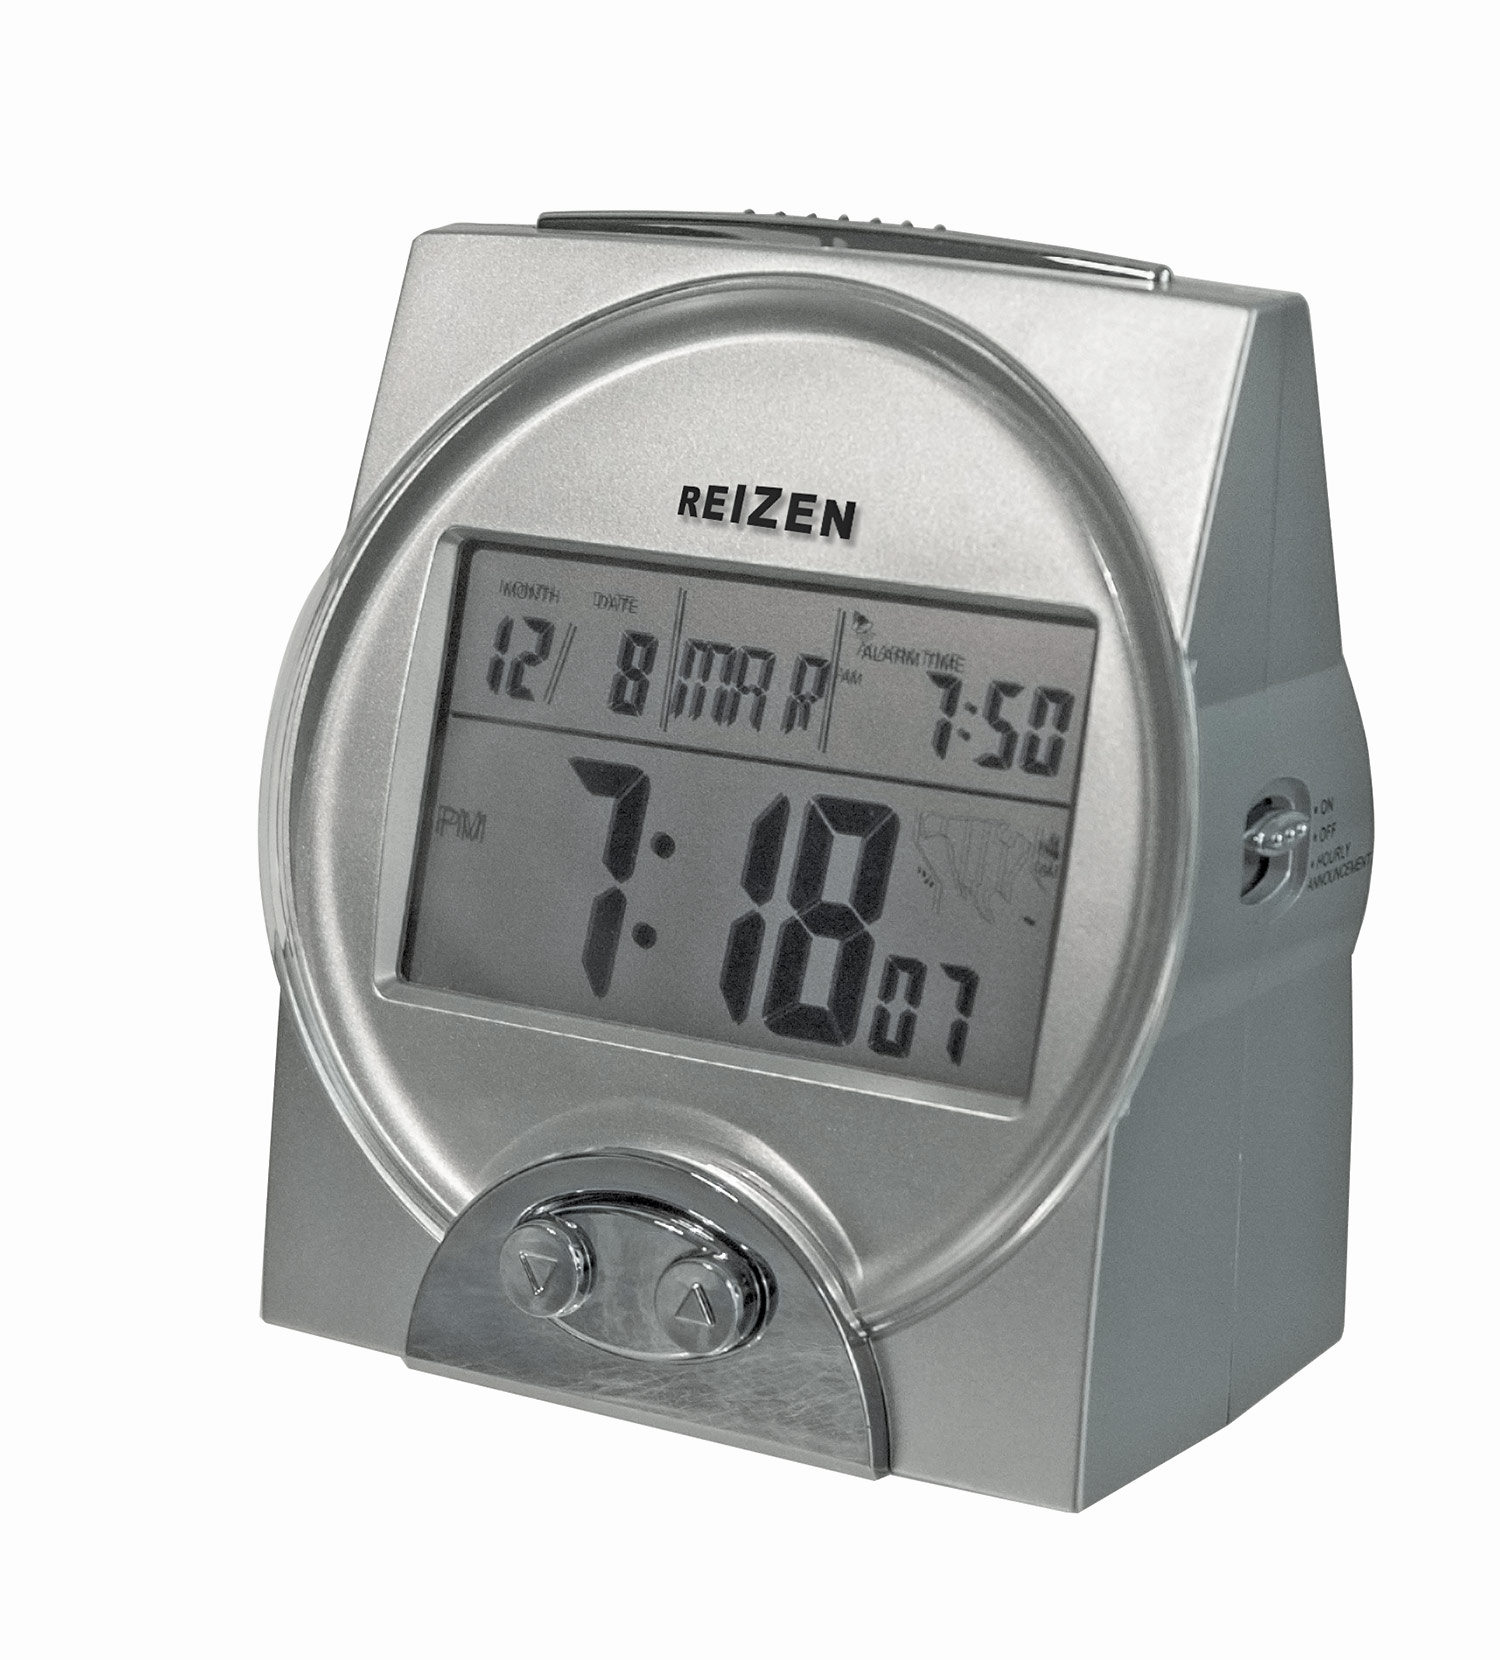 Reizen Spanish Talking Atomic Alarm Clock